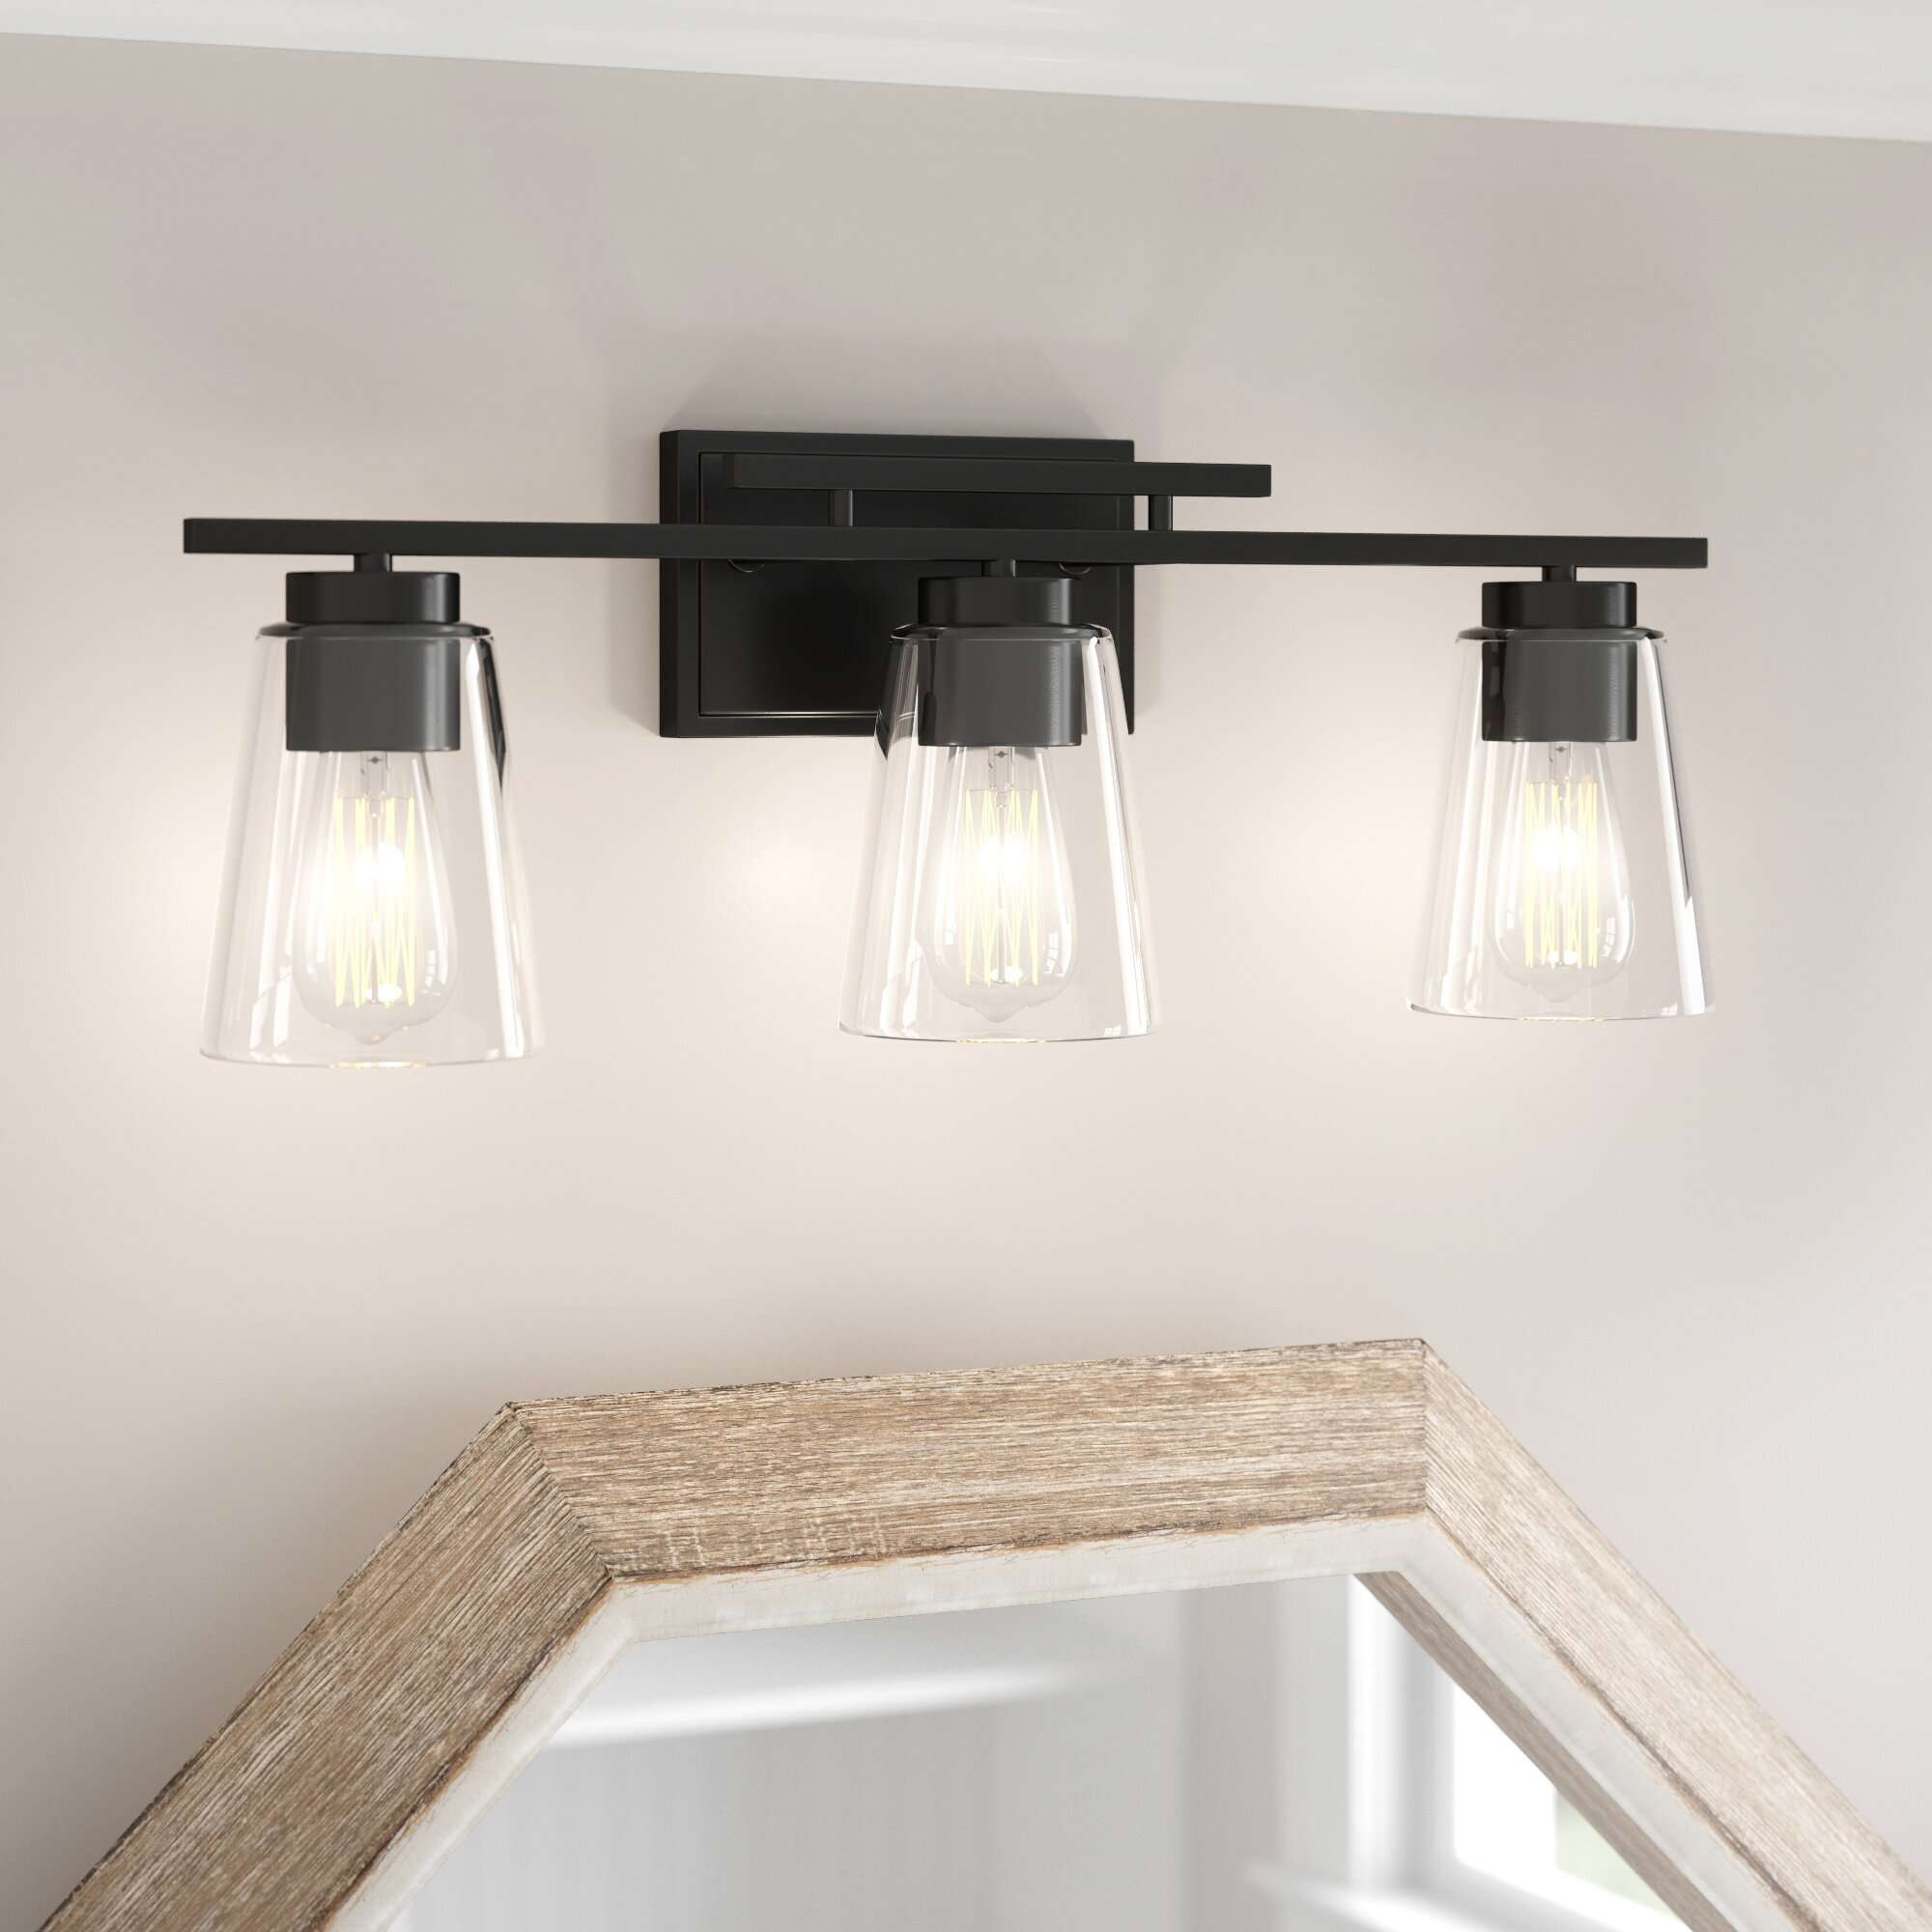 Three Posts Averi 3-Light Dimmable Vanity Light